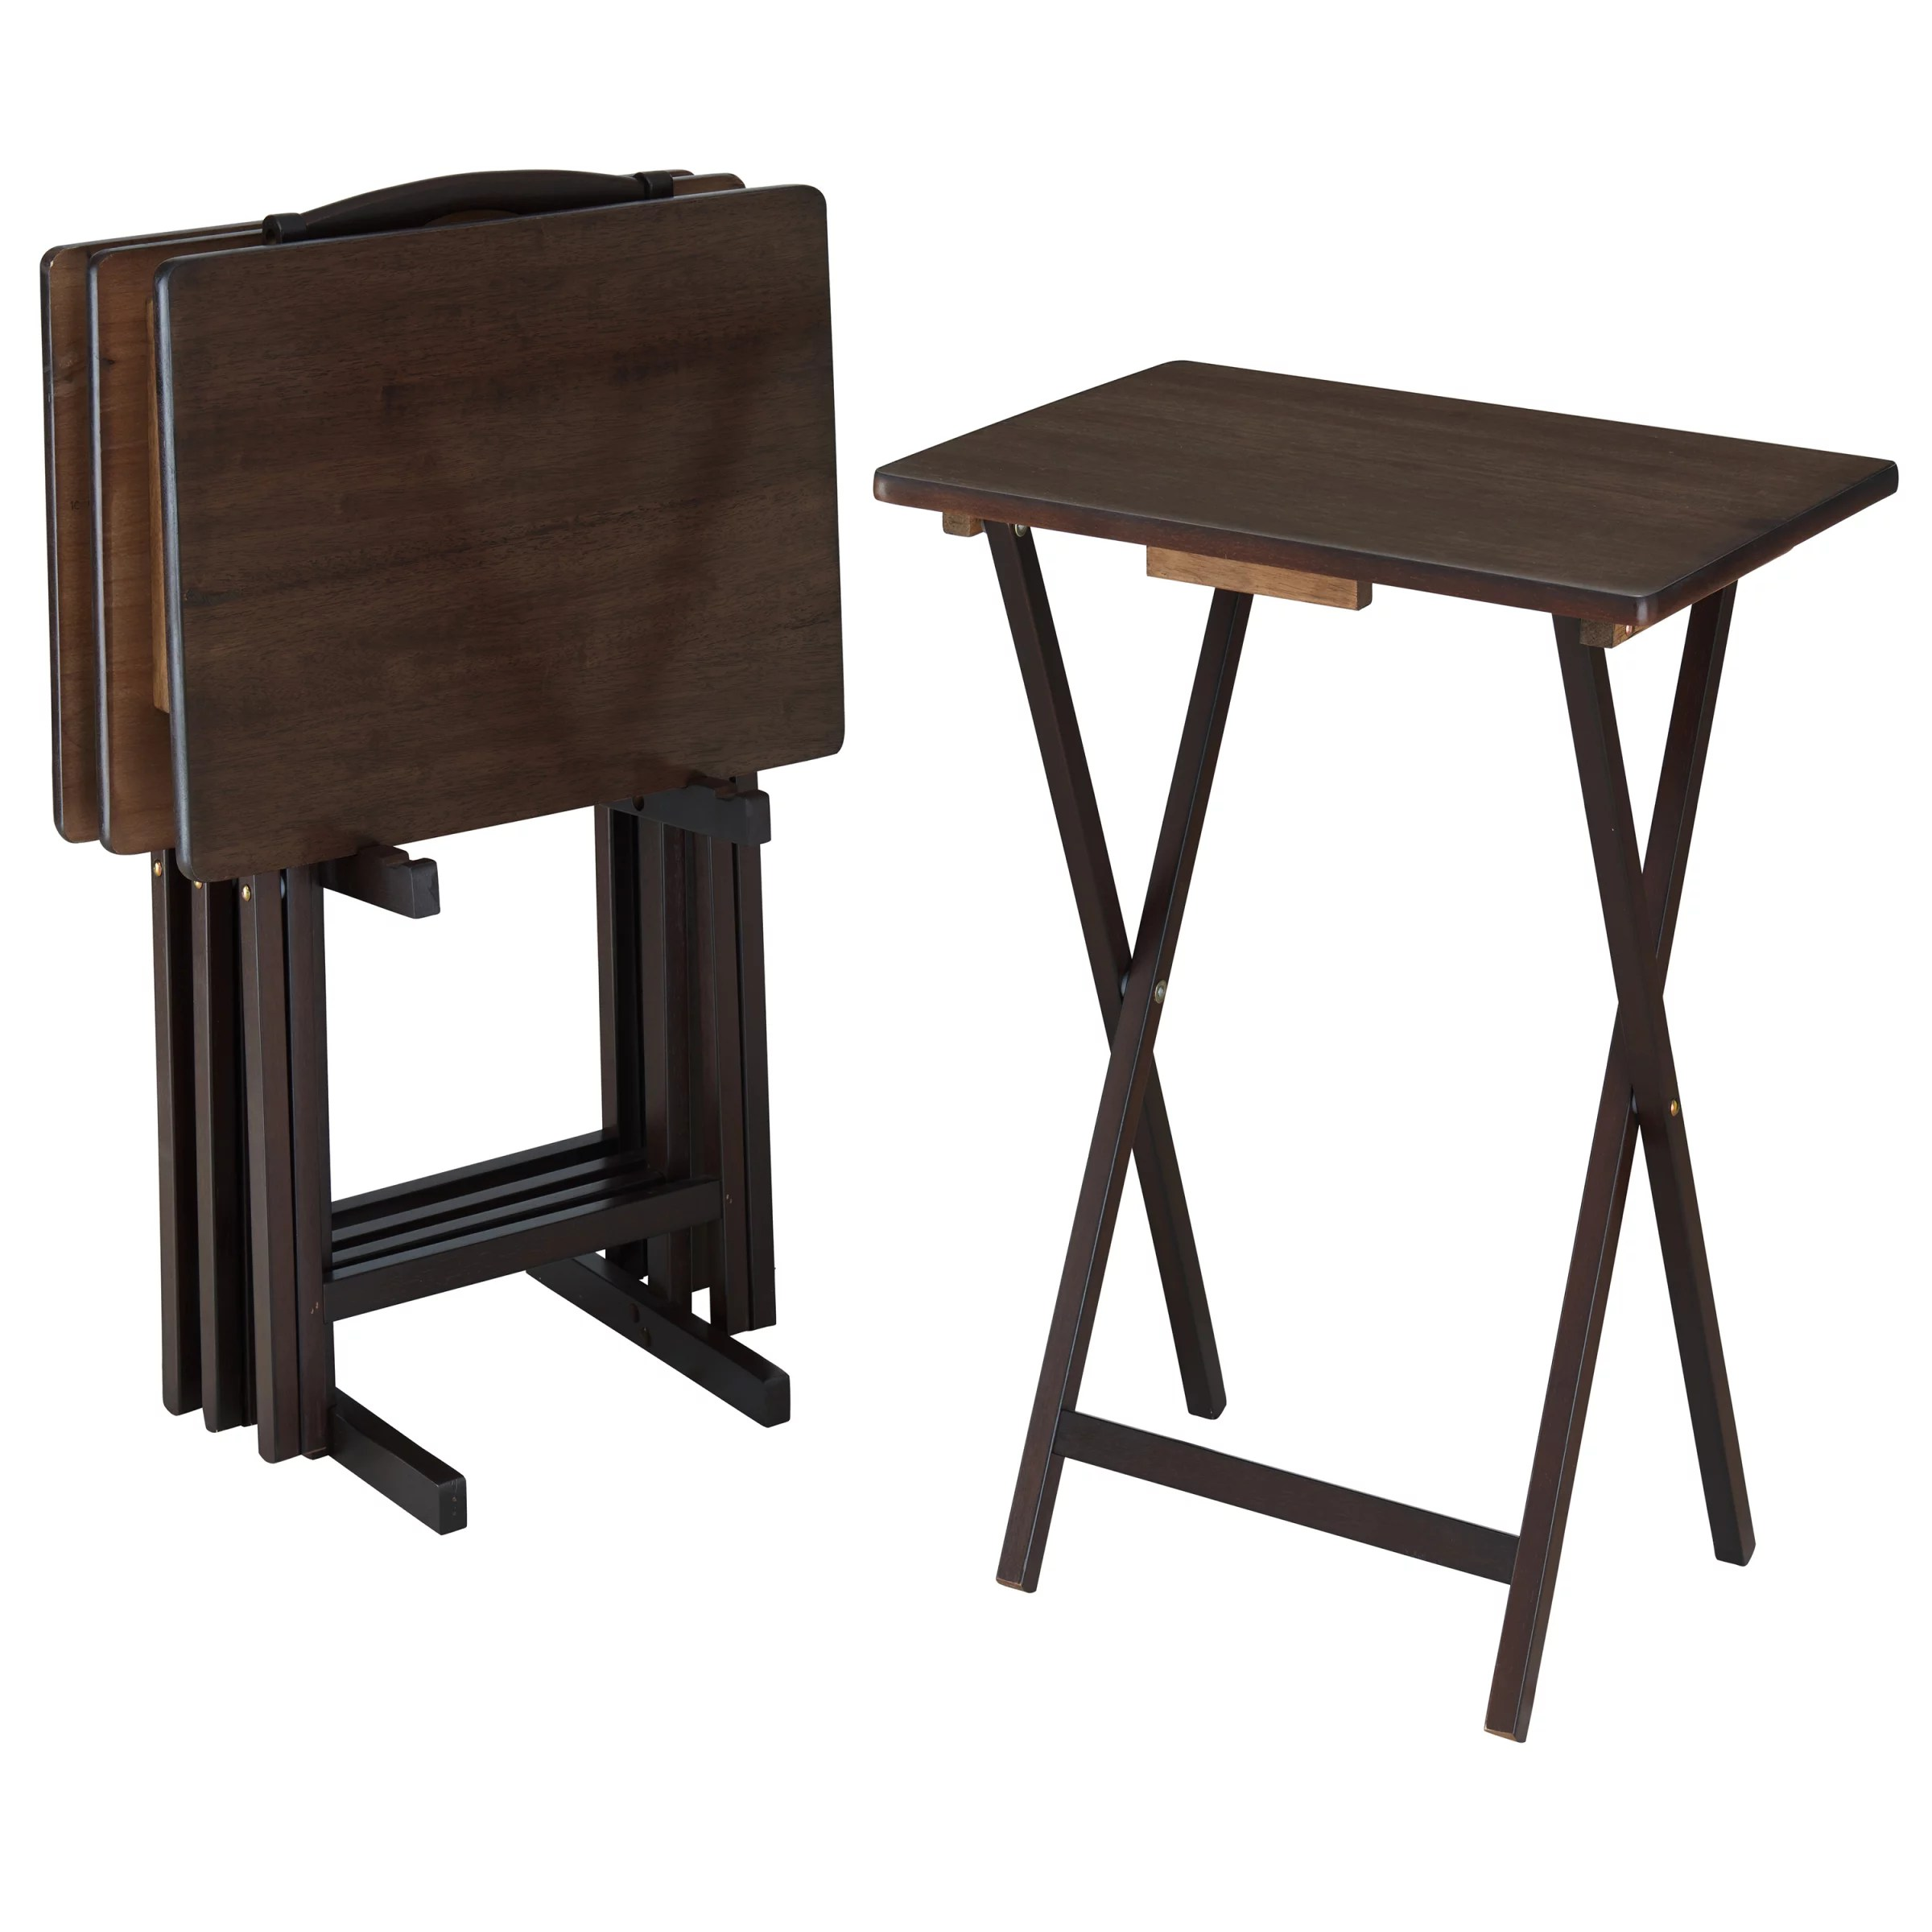 mainstays walnut 5 piece folding tv tray table set 4 trays 1 stand walmart com